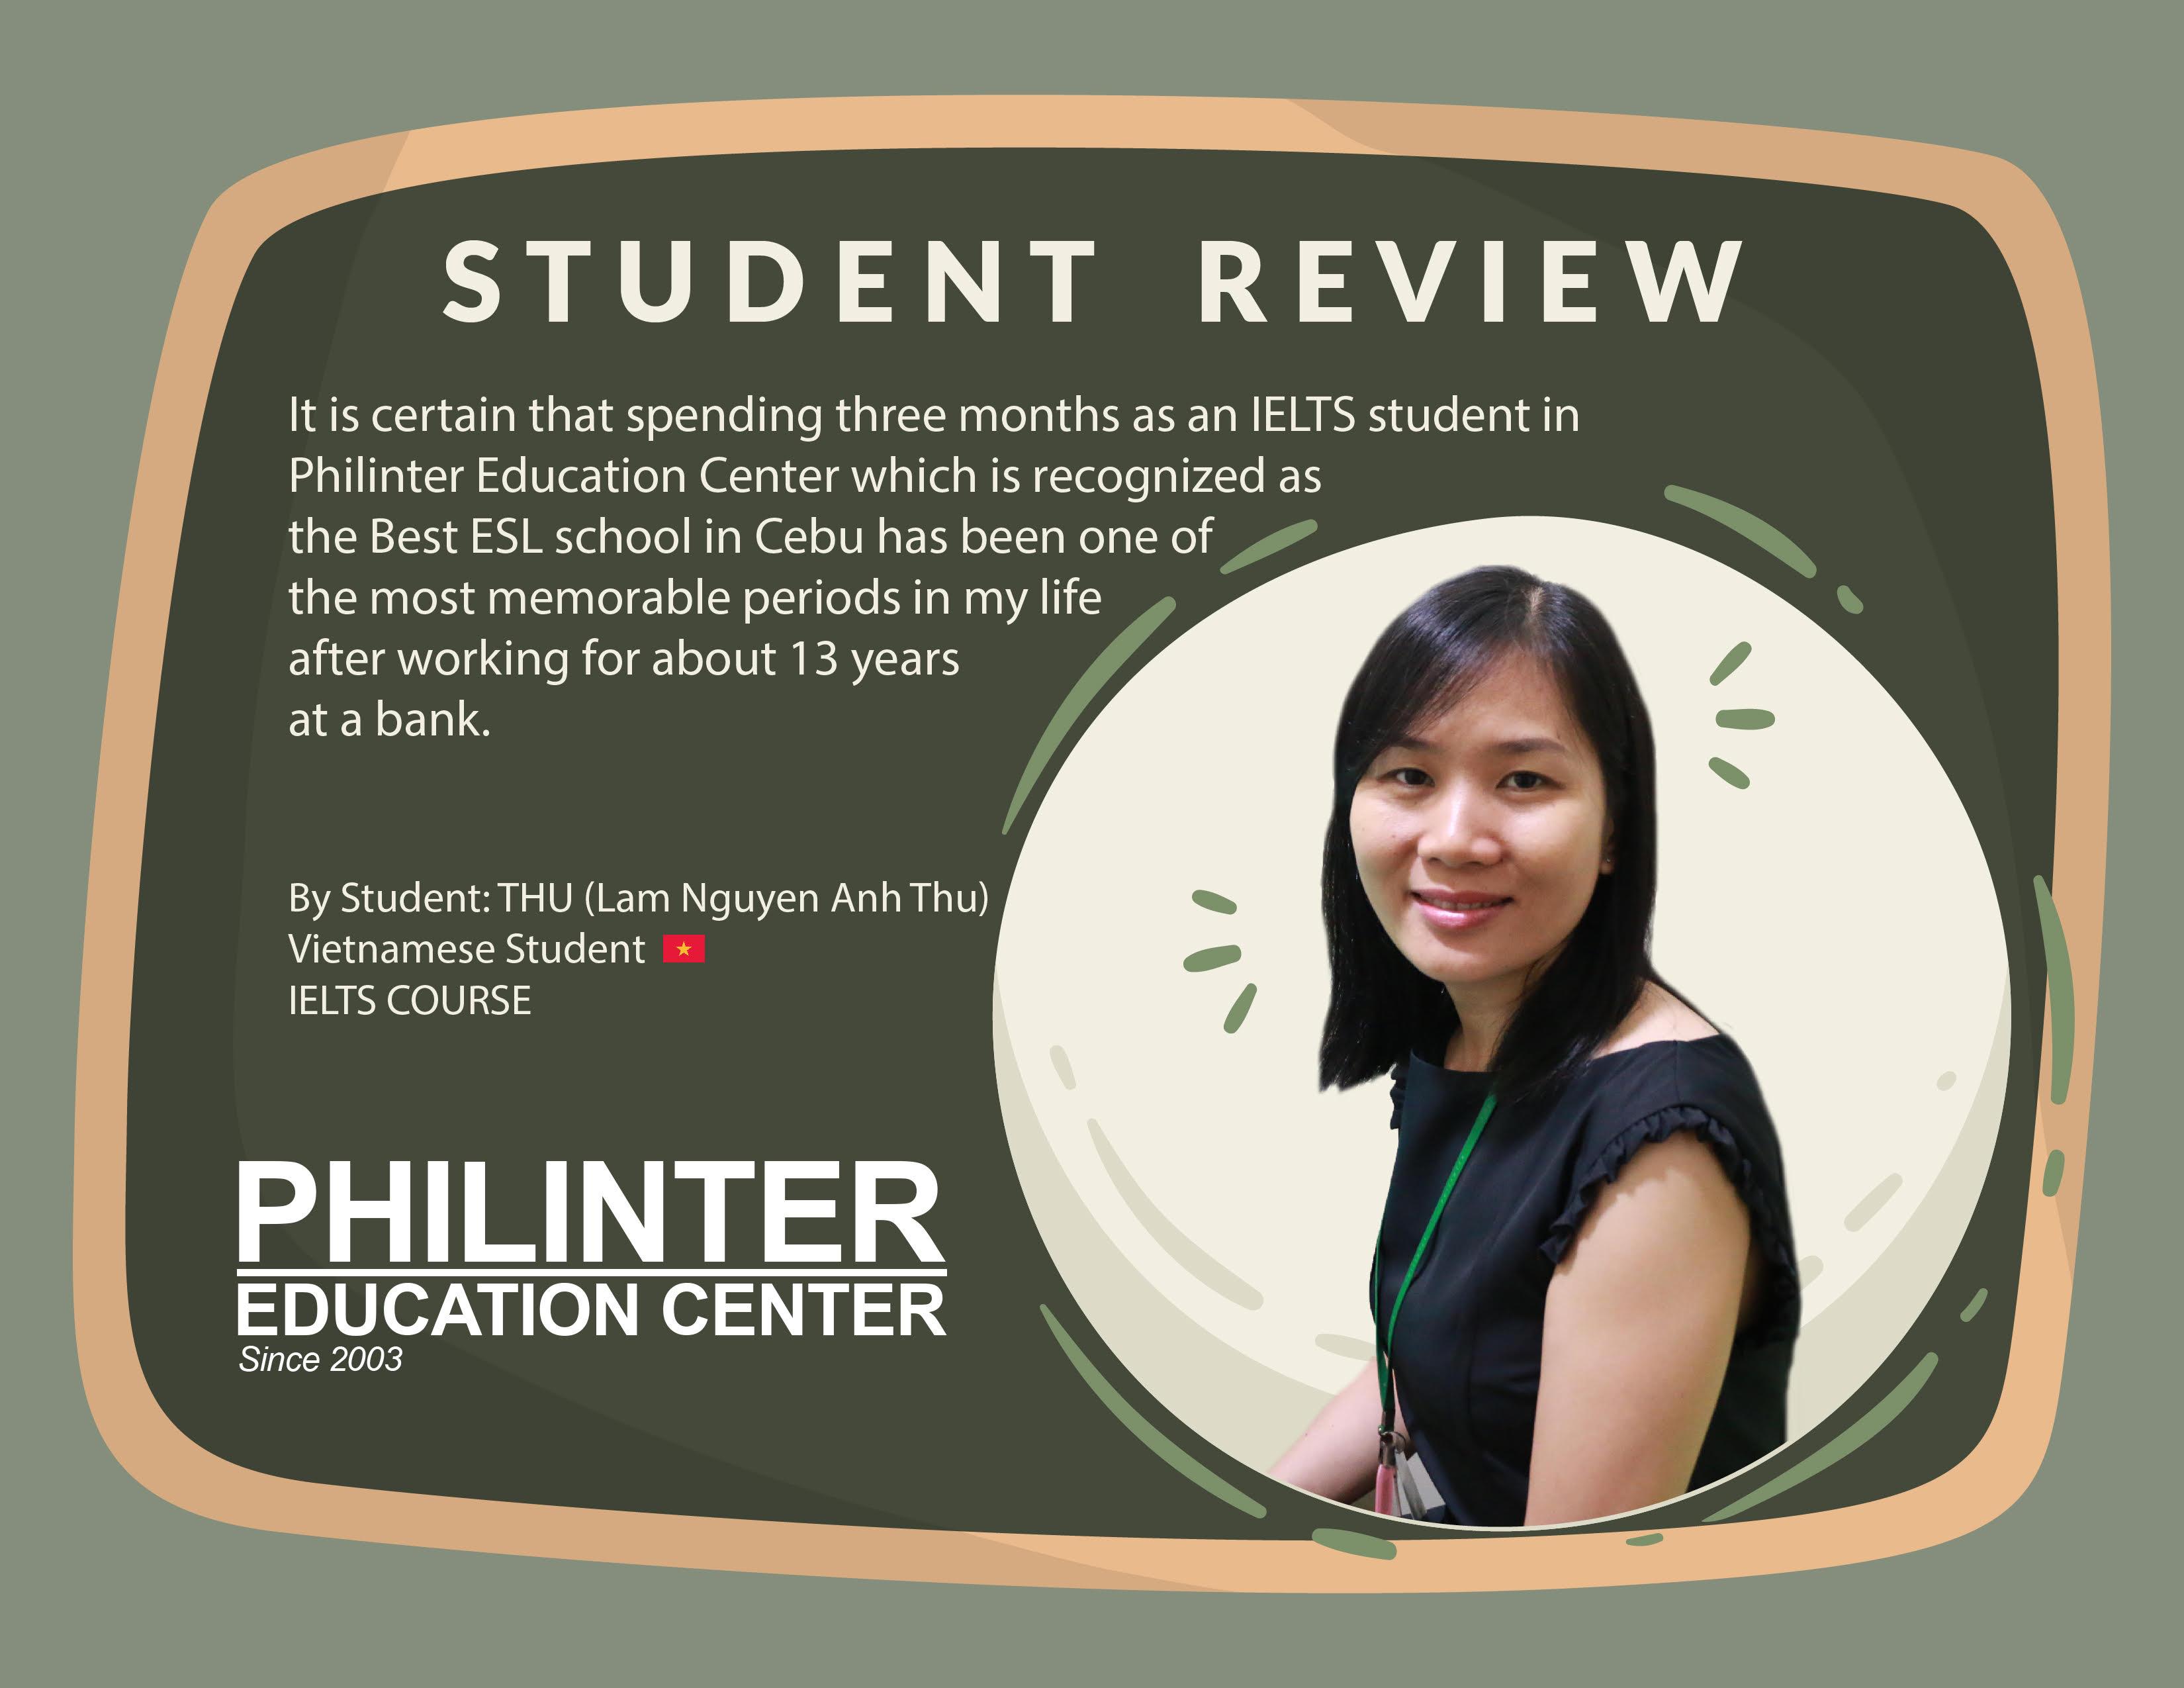 kinh nghiệm du học Philippines